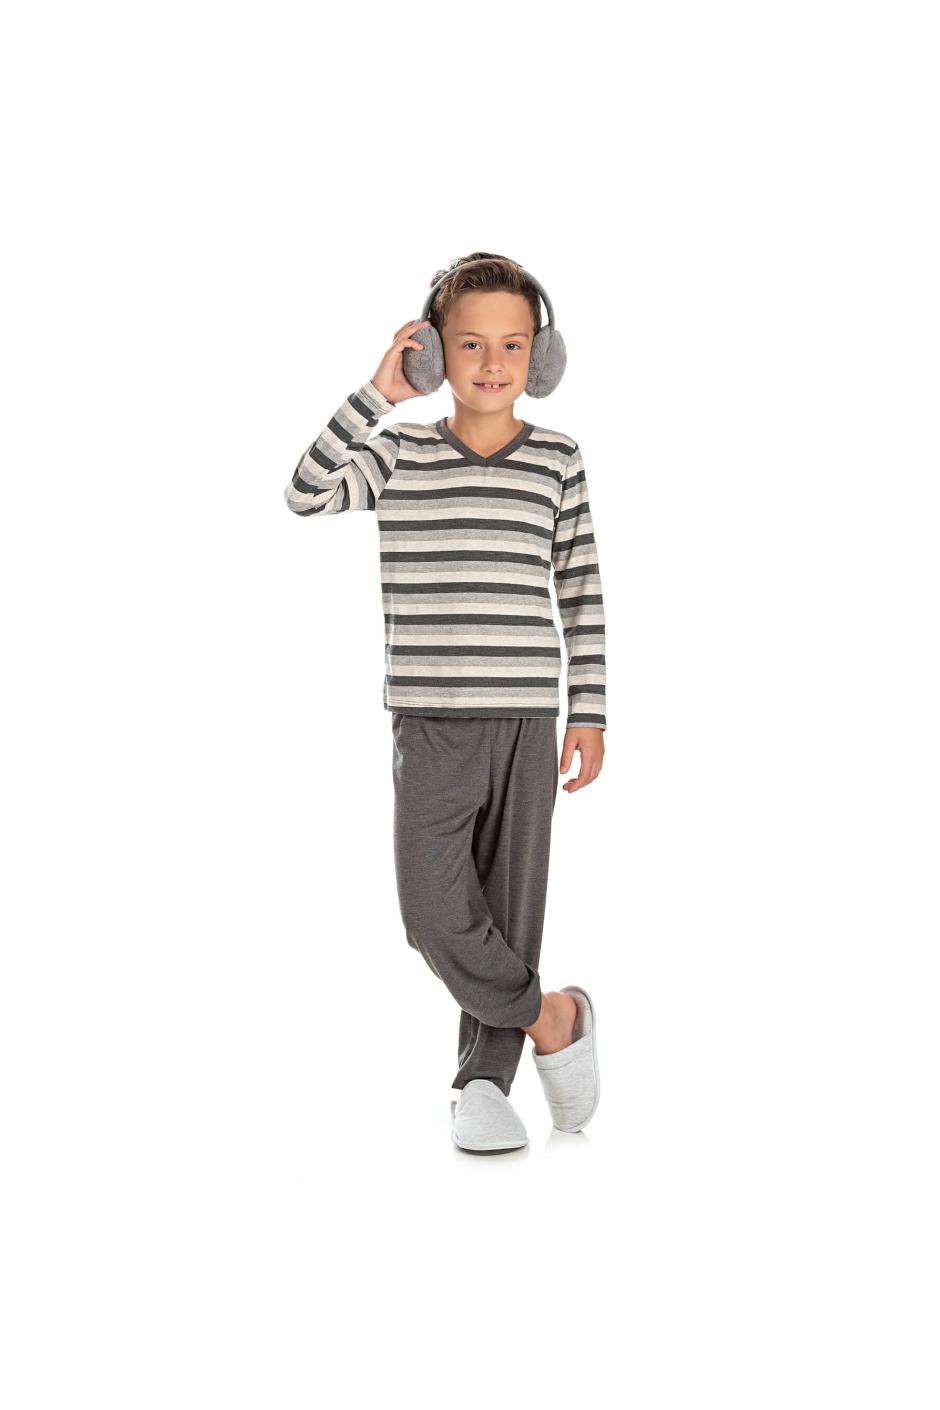 014/C - Pijama Infantil Masculino Listrado